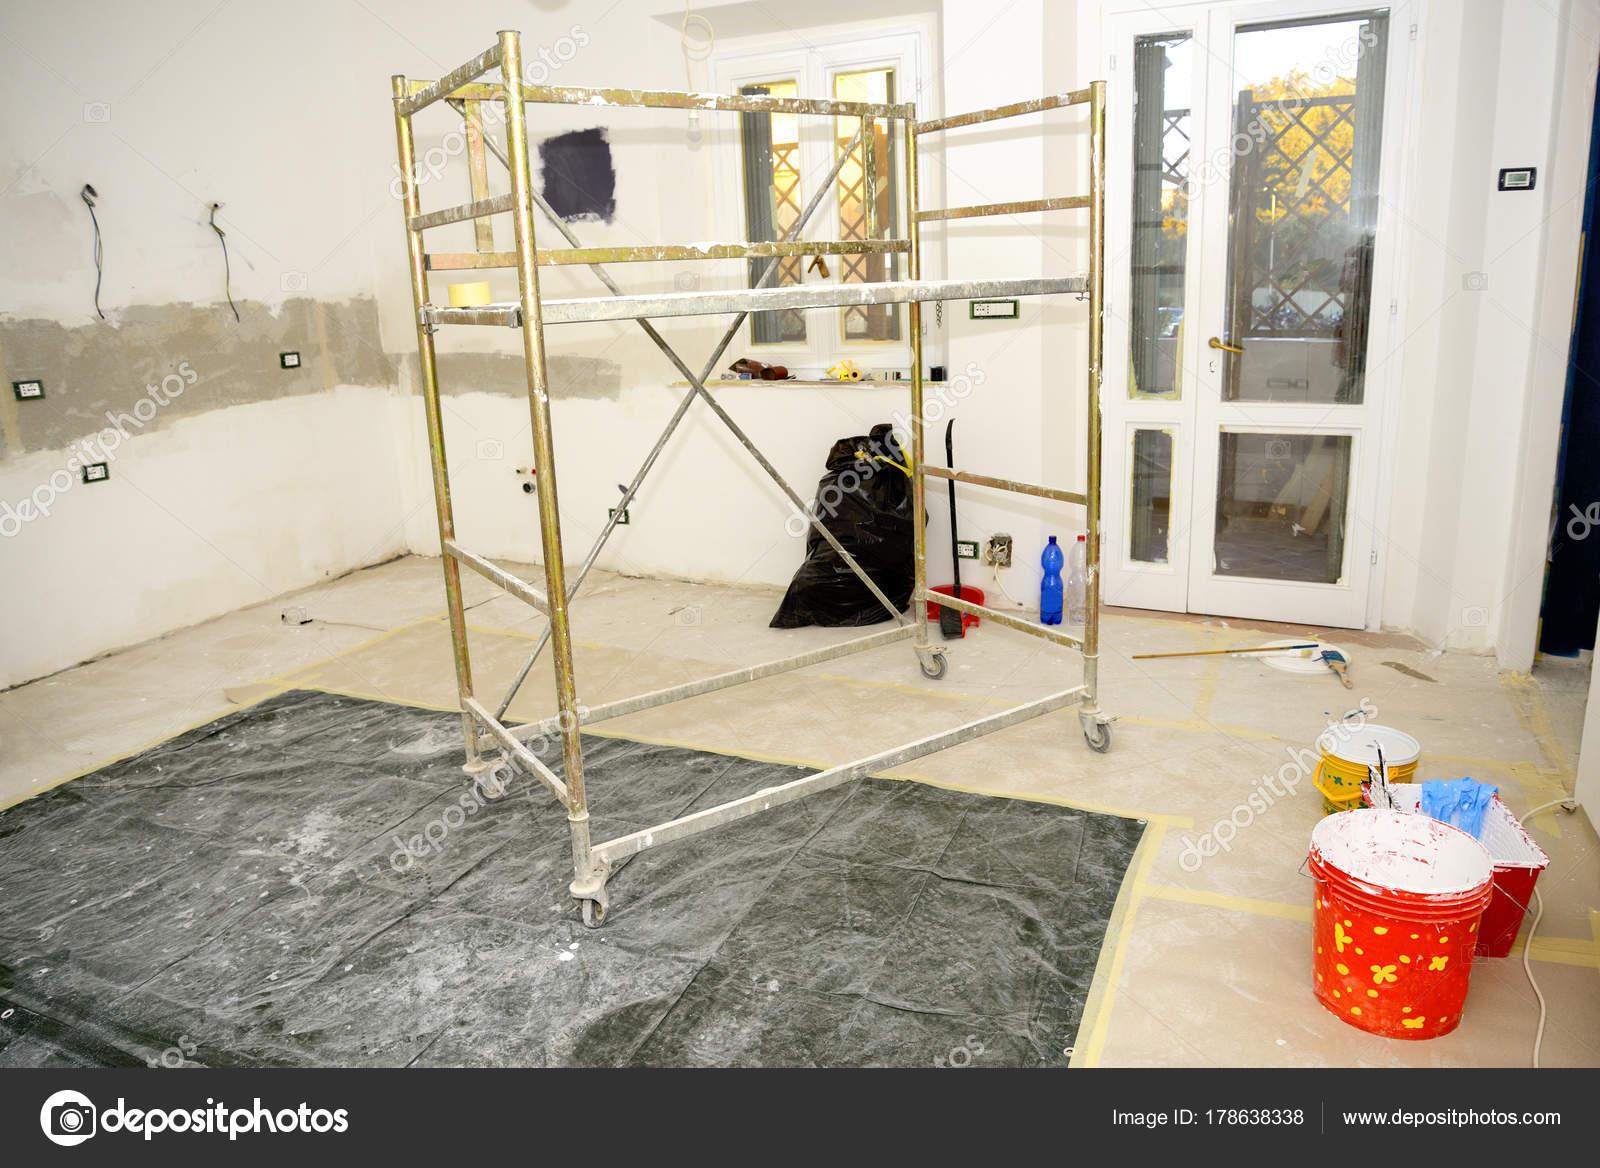 Charmant Altbau Sanierung Ein Neues Haus U2014 Stockfoto